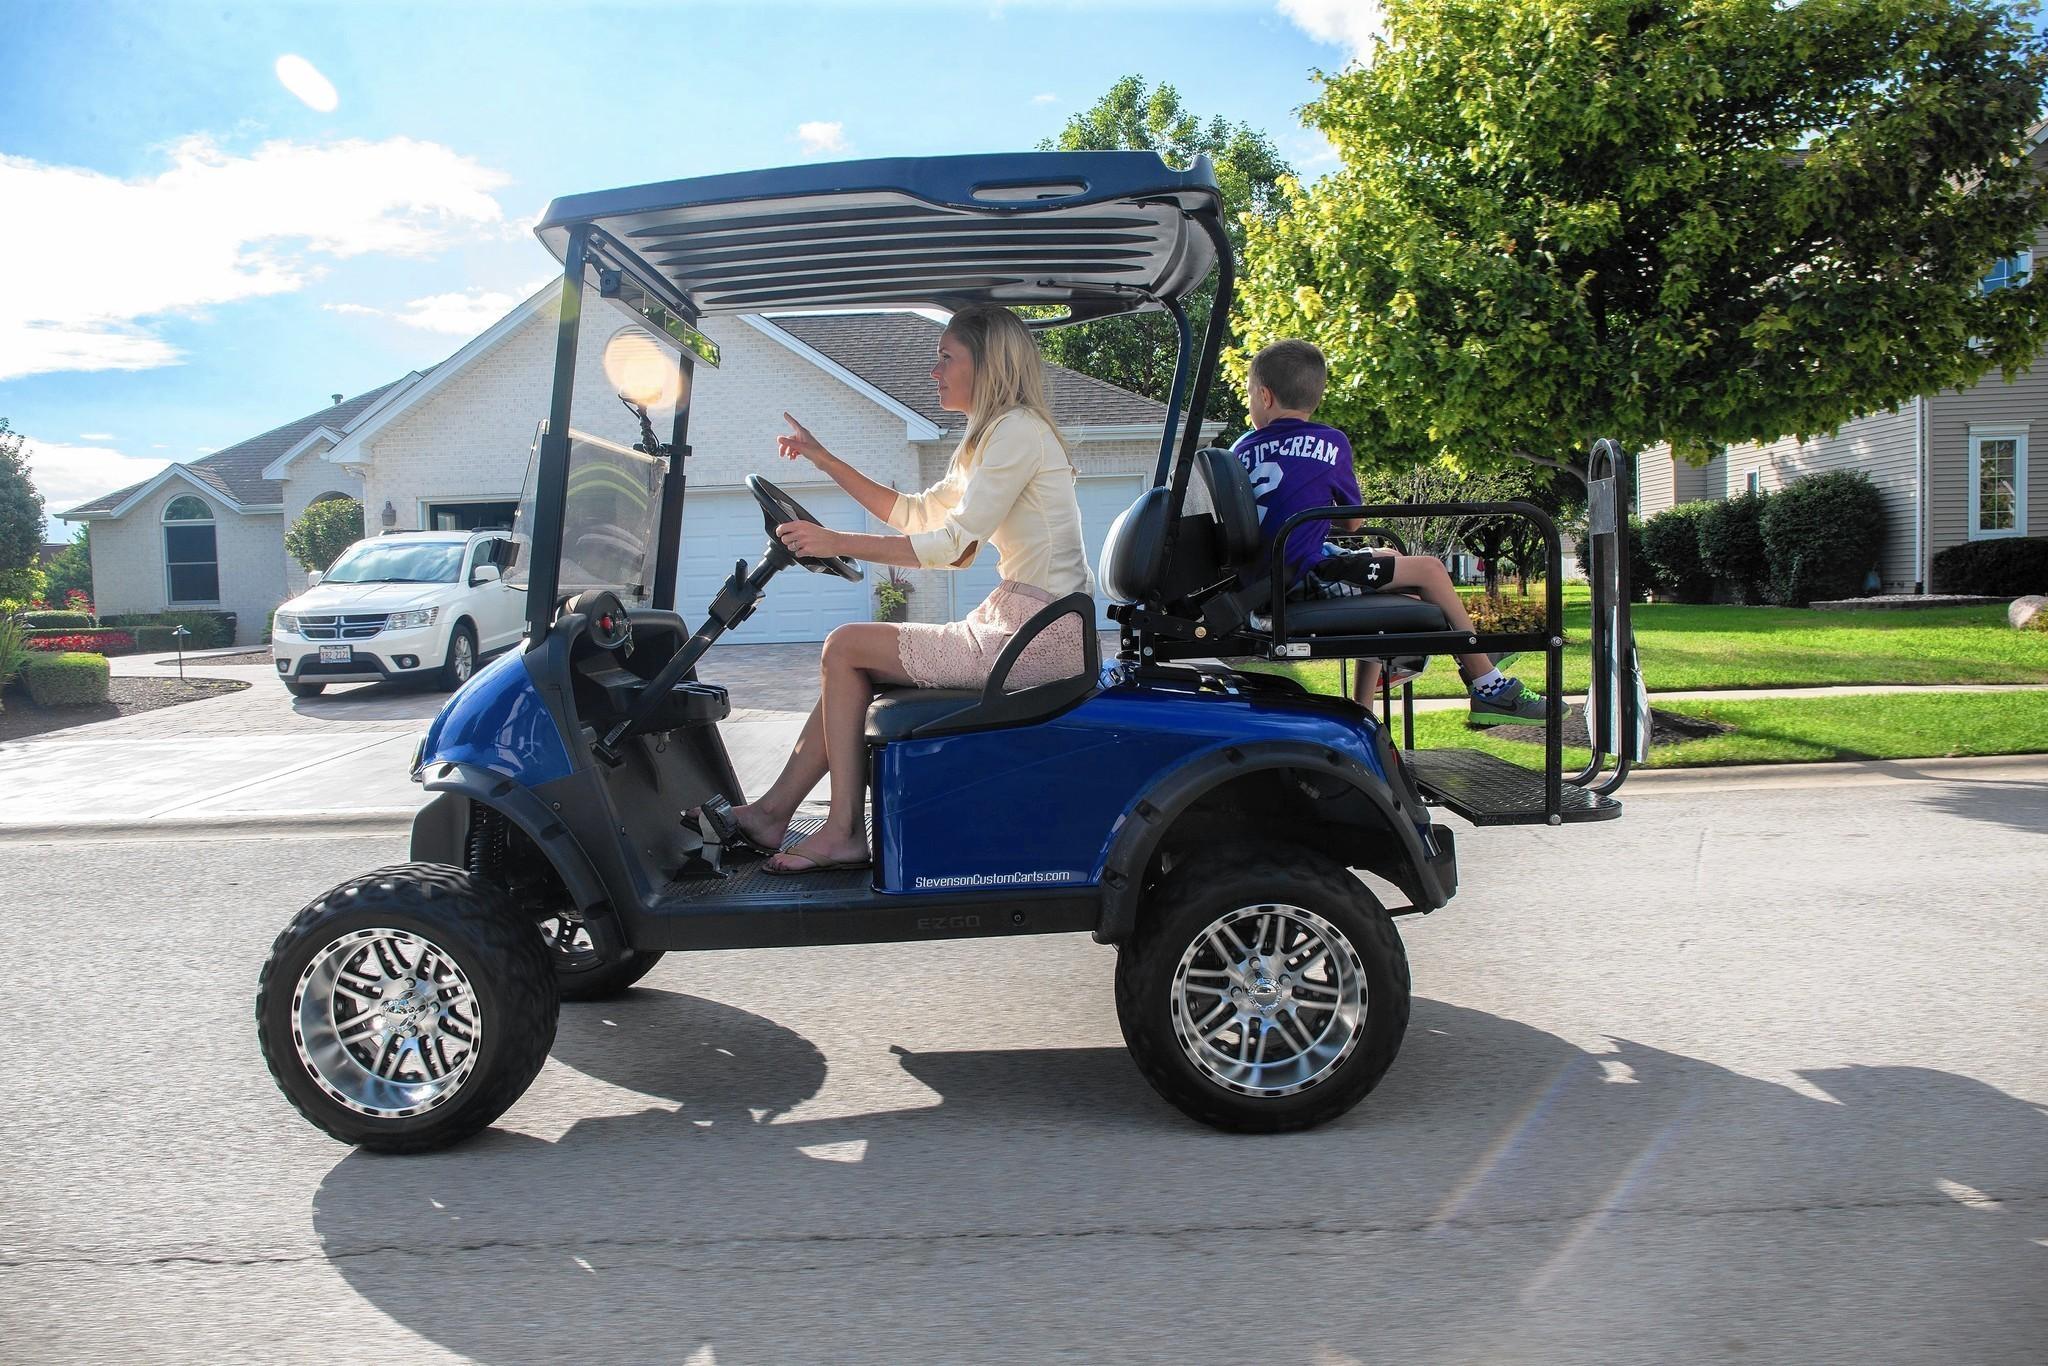 Yorkville OKs new golf cart policy - Aurora Beacon-News